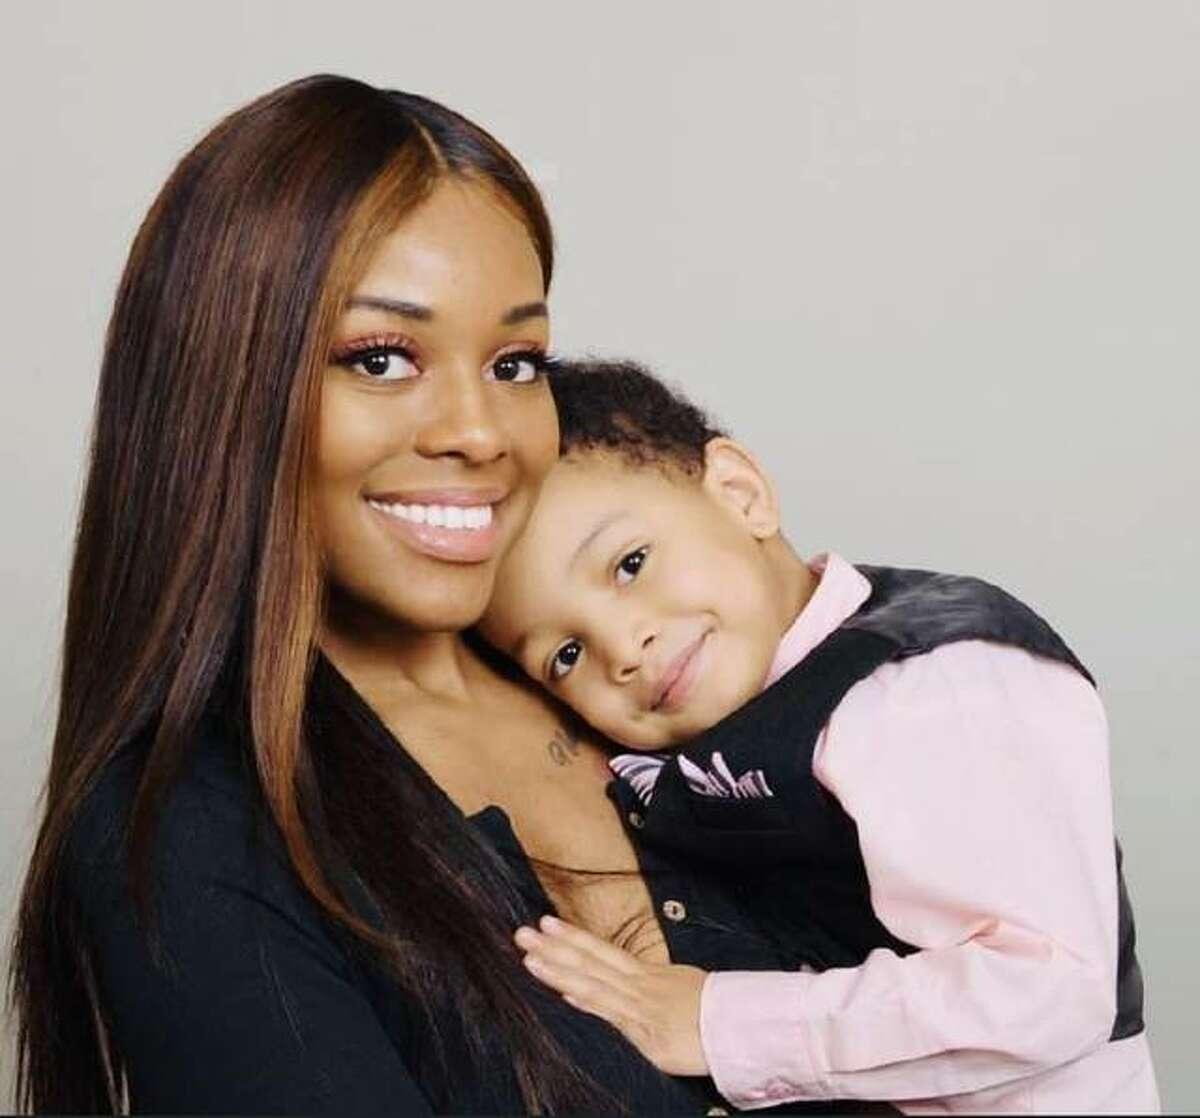 Kasia, single mom of Kayden